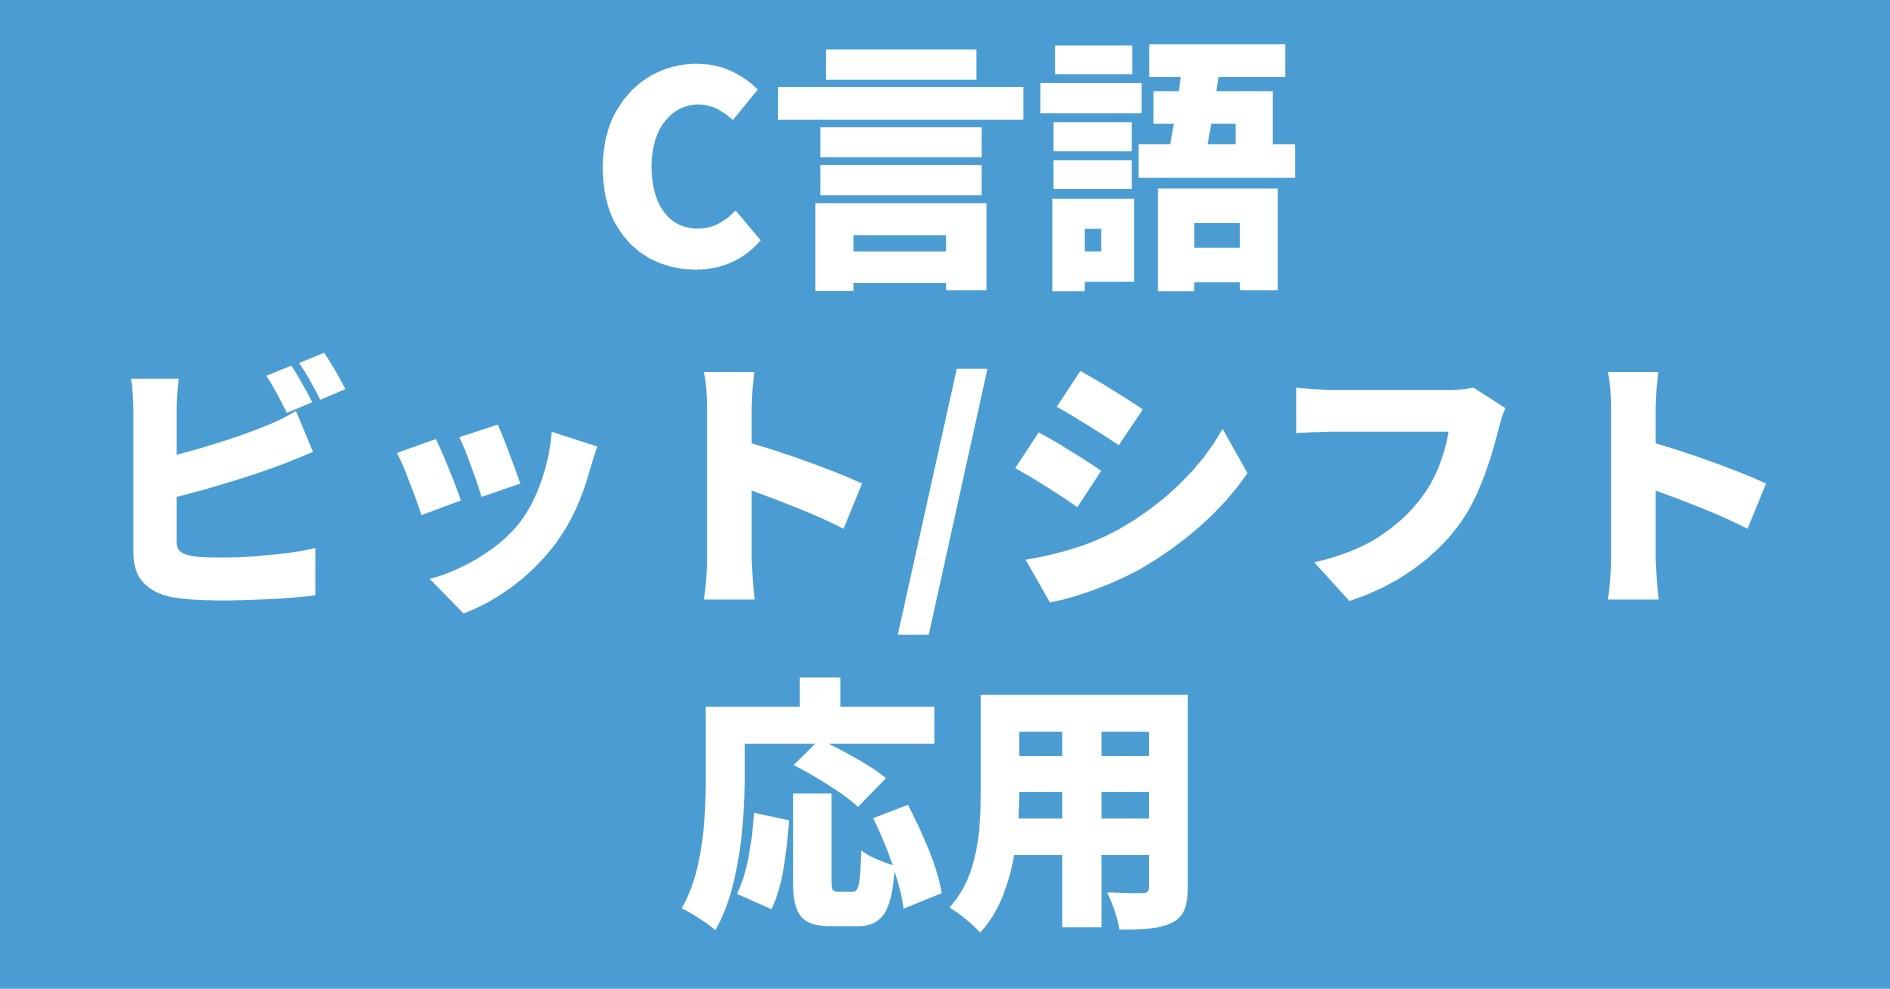 C言語 ビット/シフト 応用